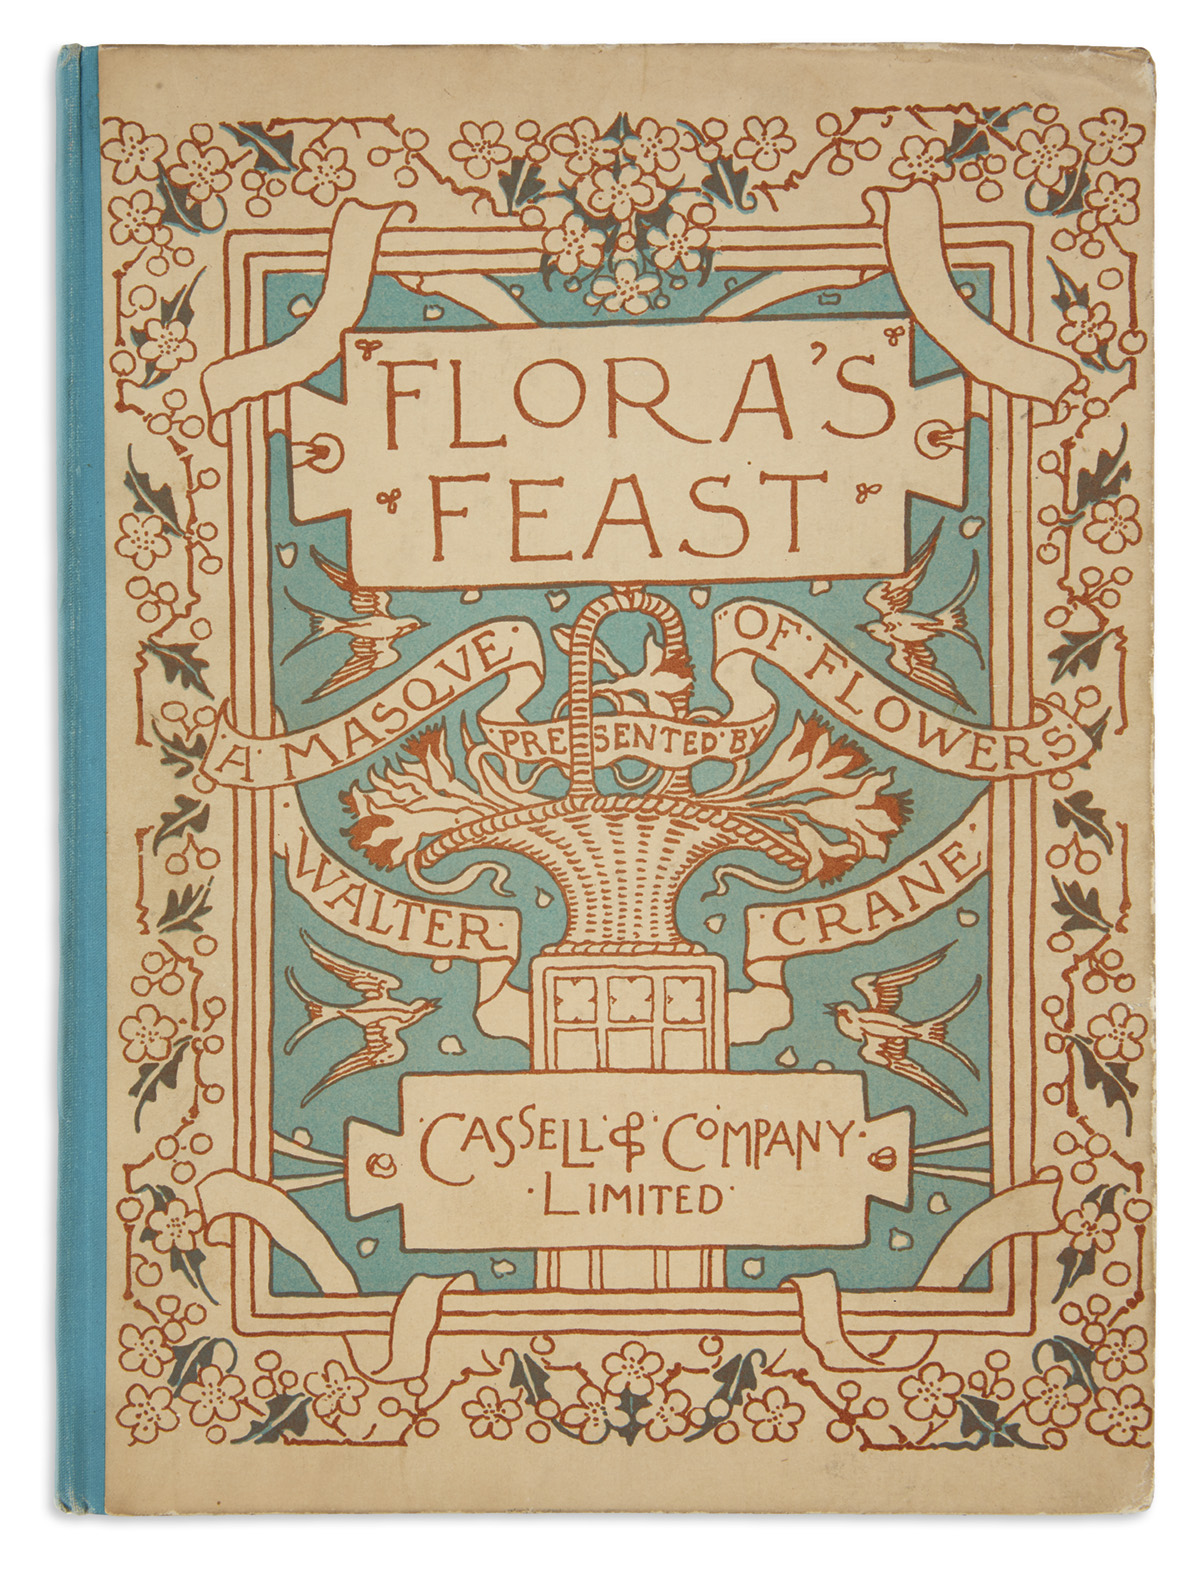 (CHILDRENS-LITERATURE)-CRANE-WALTER-Floras-Feast-A-Masque-of